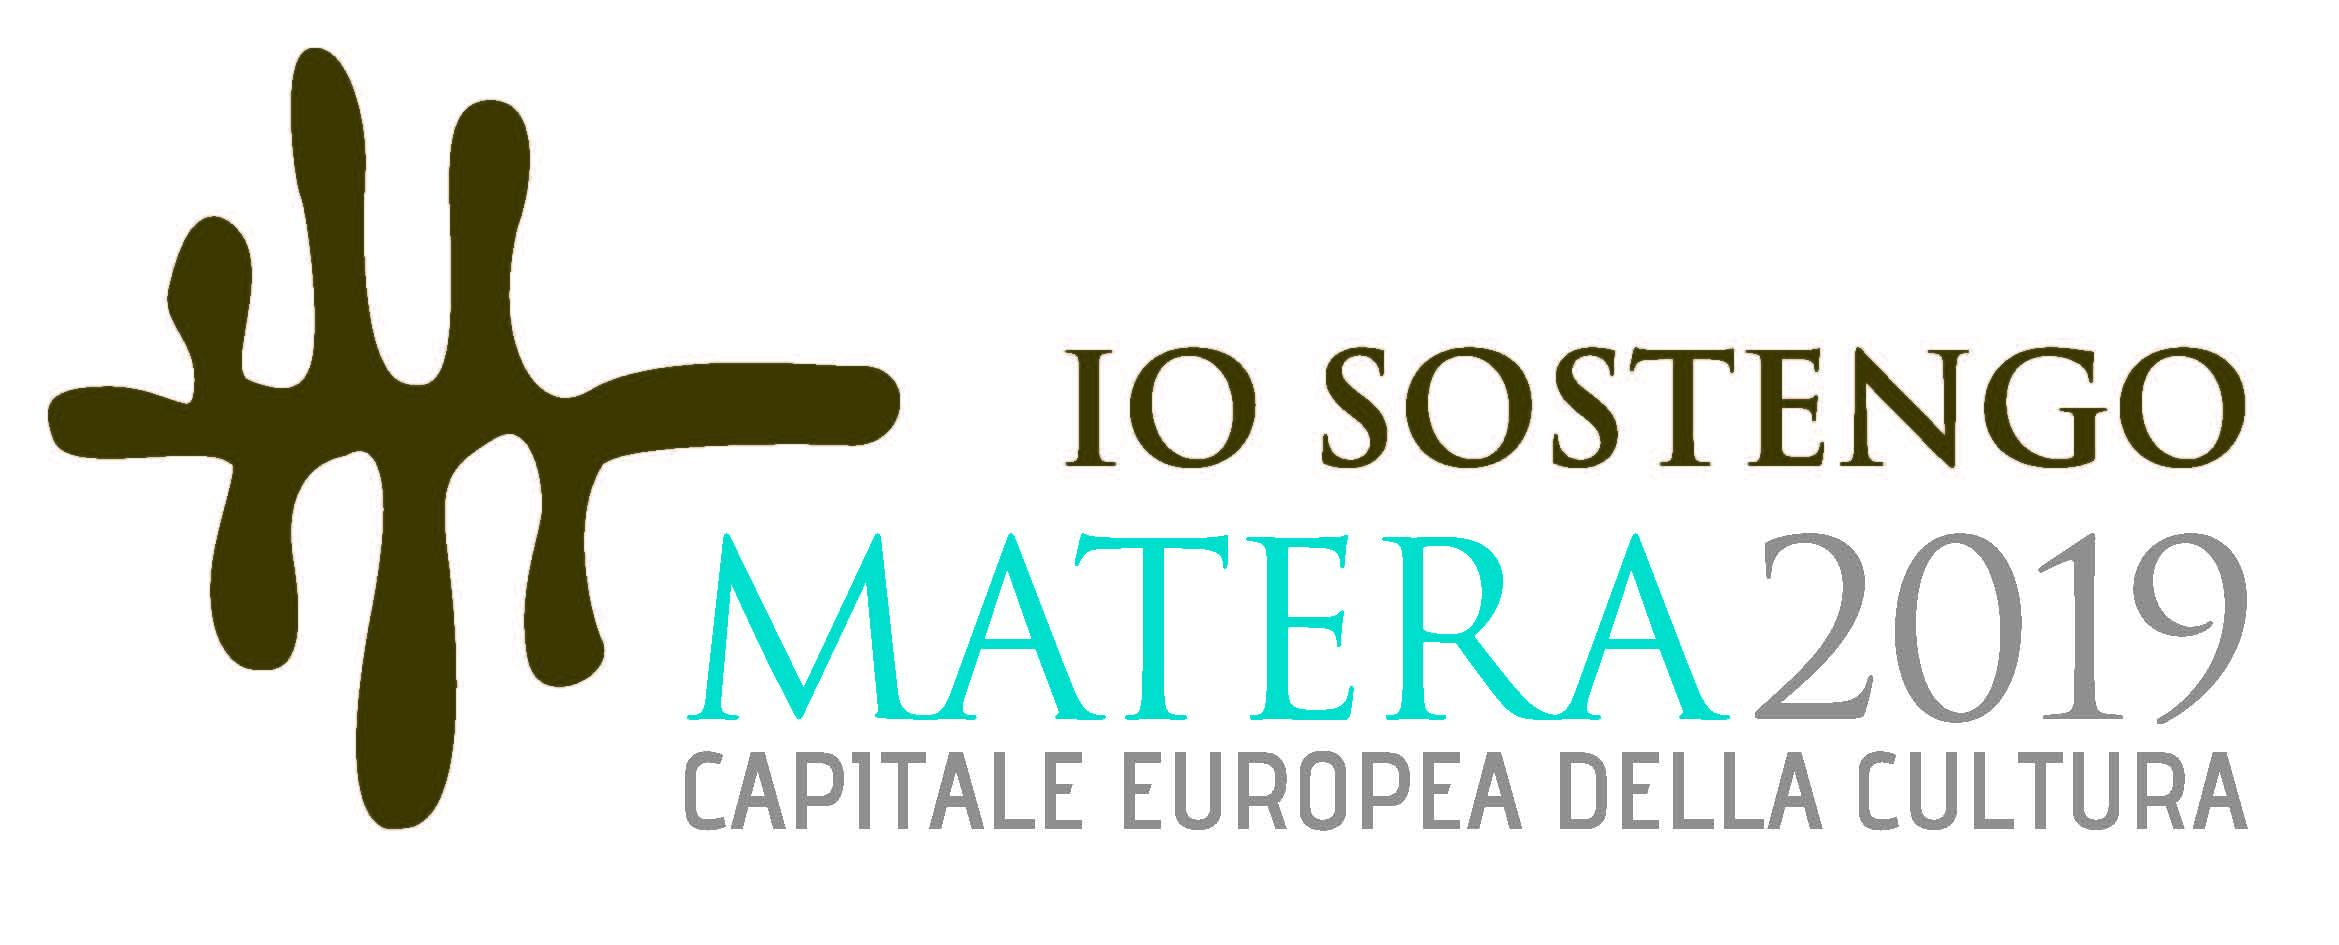 Logo_IoSostengoMatera2019